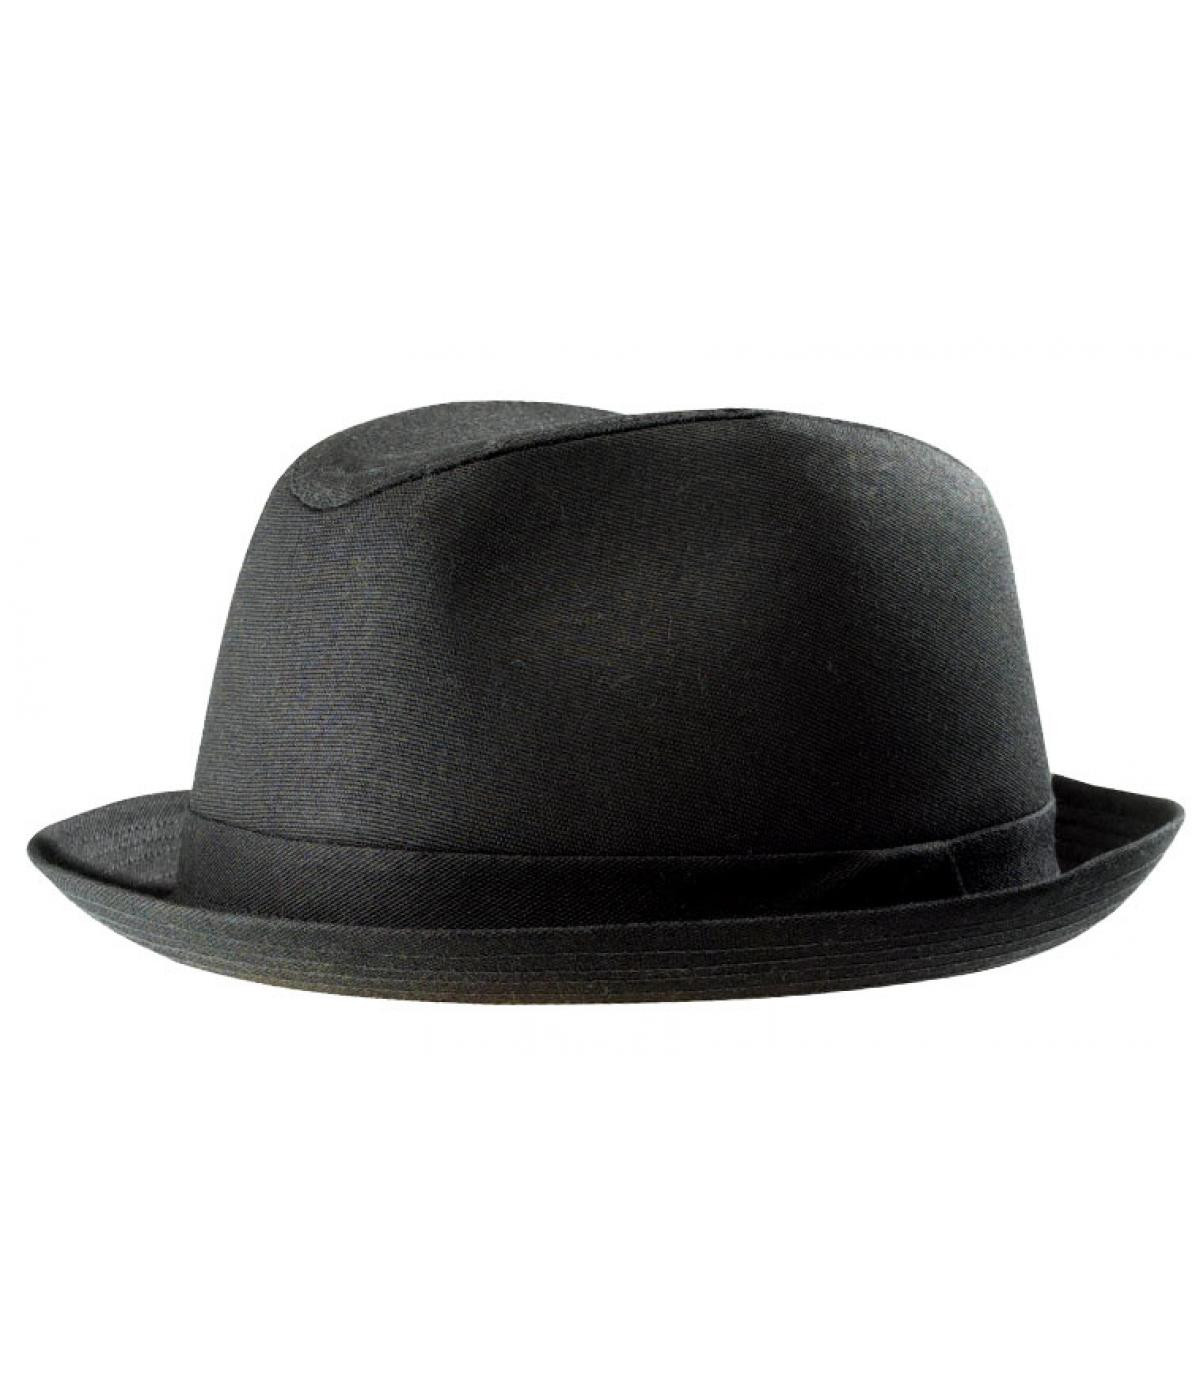 Sombrero hombre Stetson